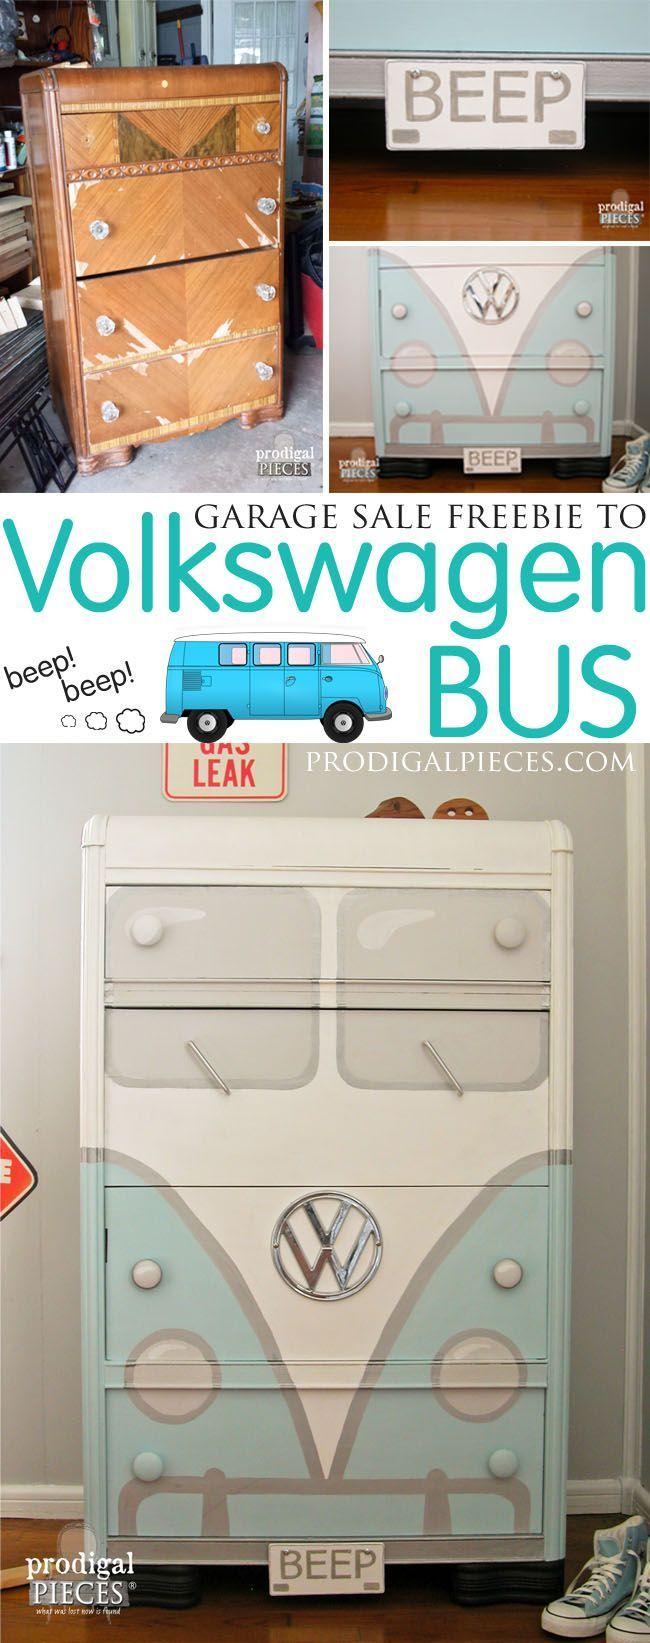 A garage sale freebie Art Deco water dresser gets a sweet Volkswagen Bus makeover by Prodigal Pieces www.prodigalpieces.com #prodigalpieces